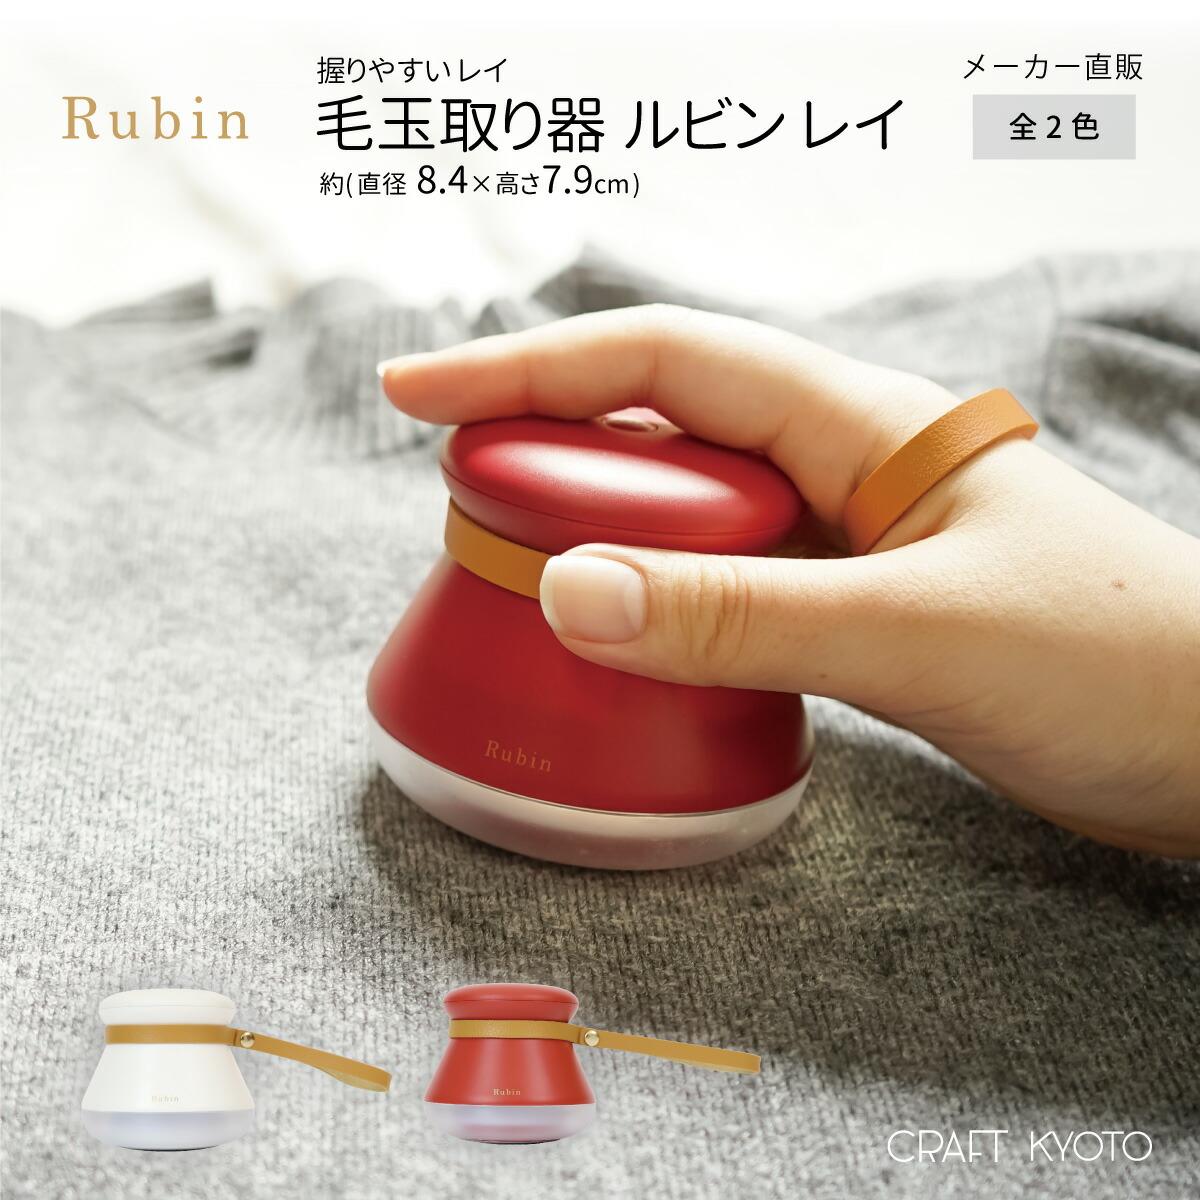 Rubin ルビン レイ 毛玉取り器